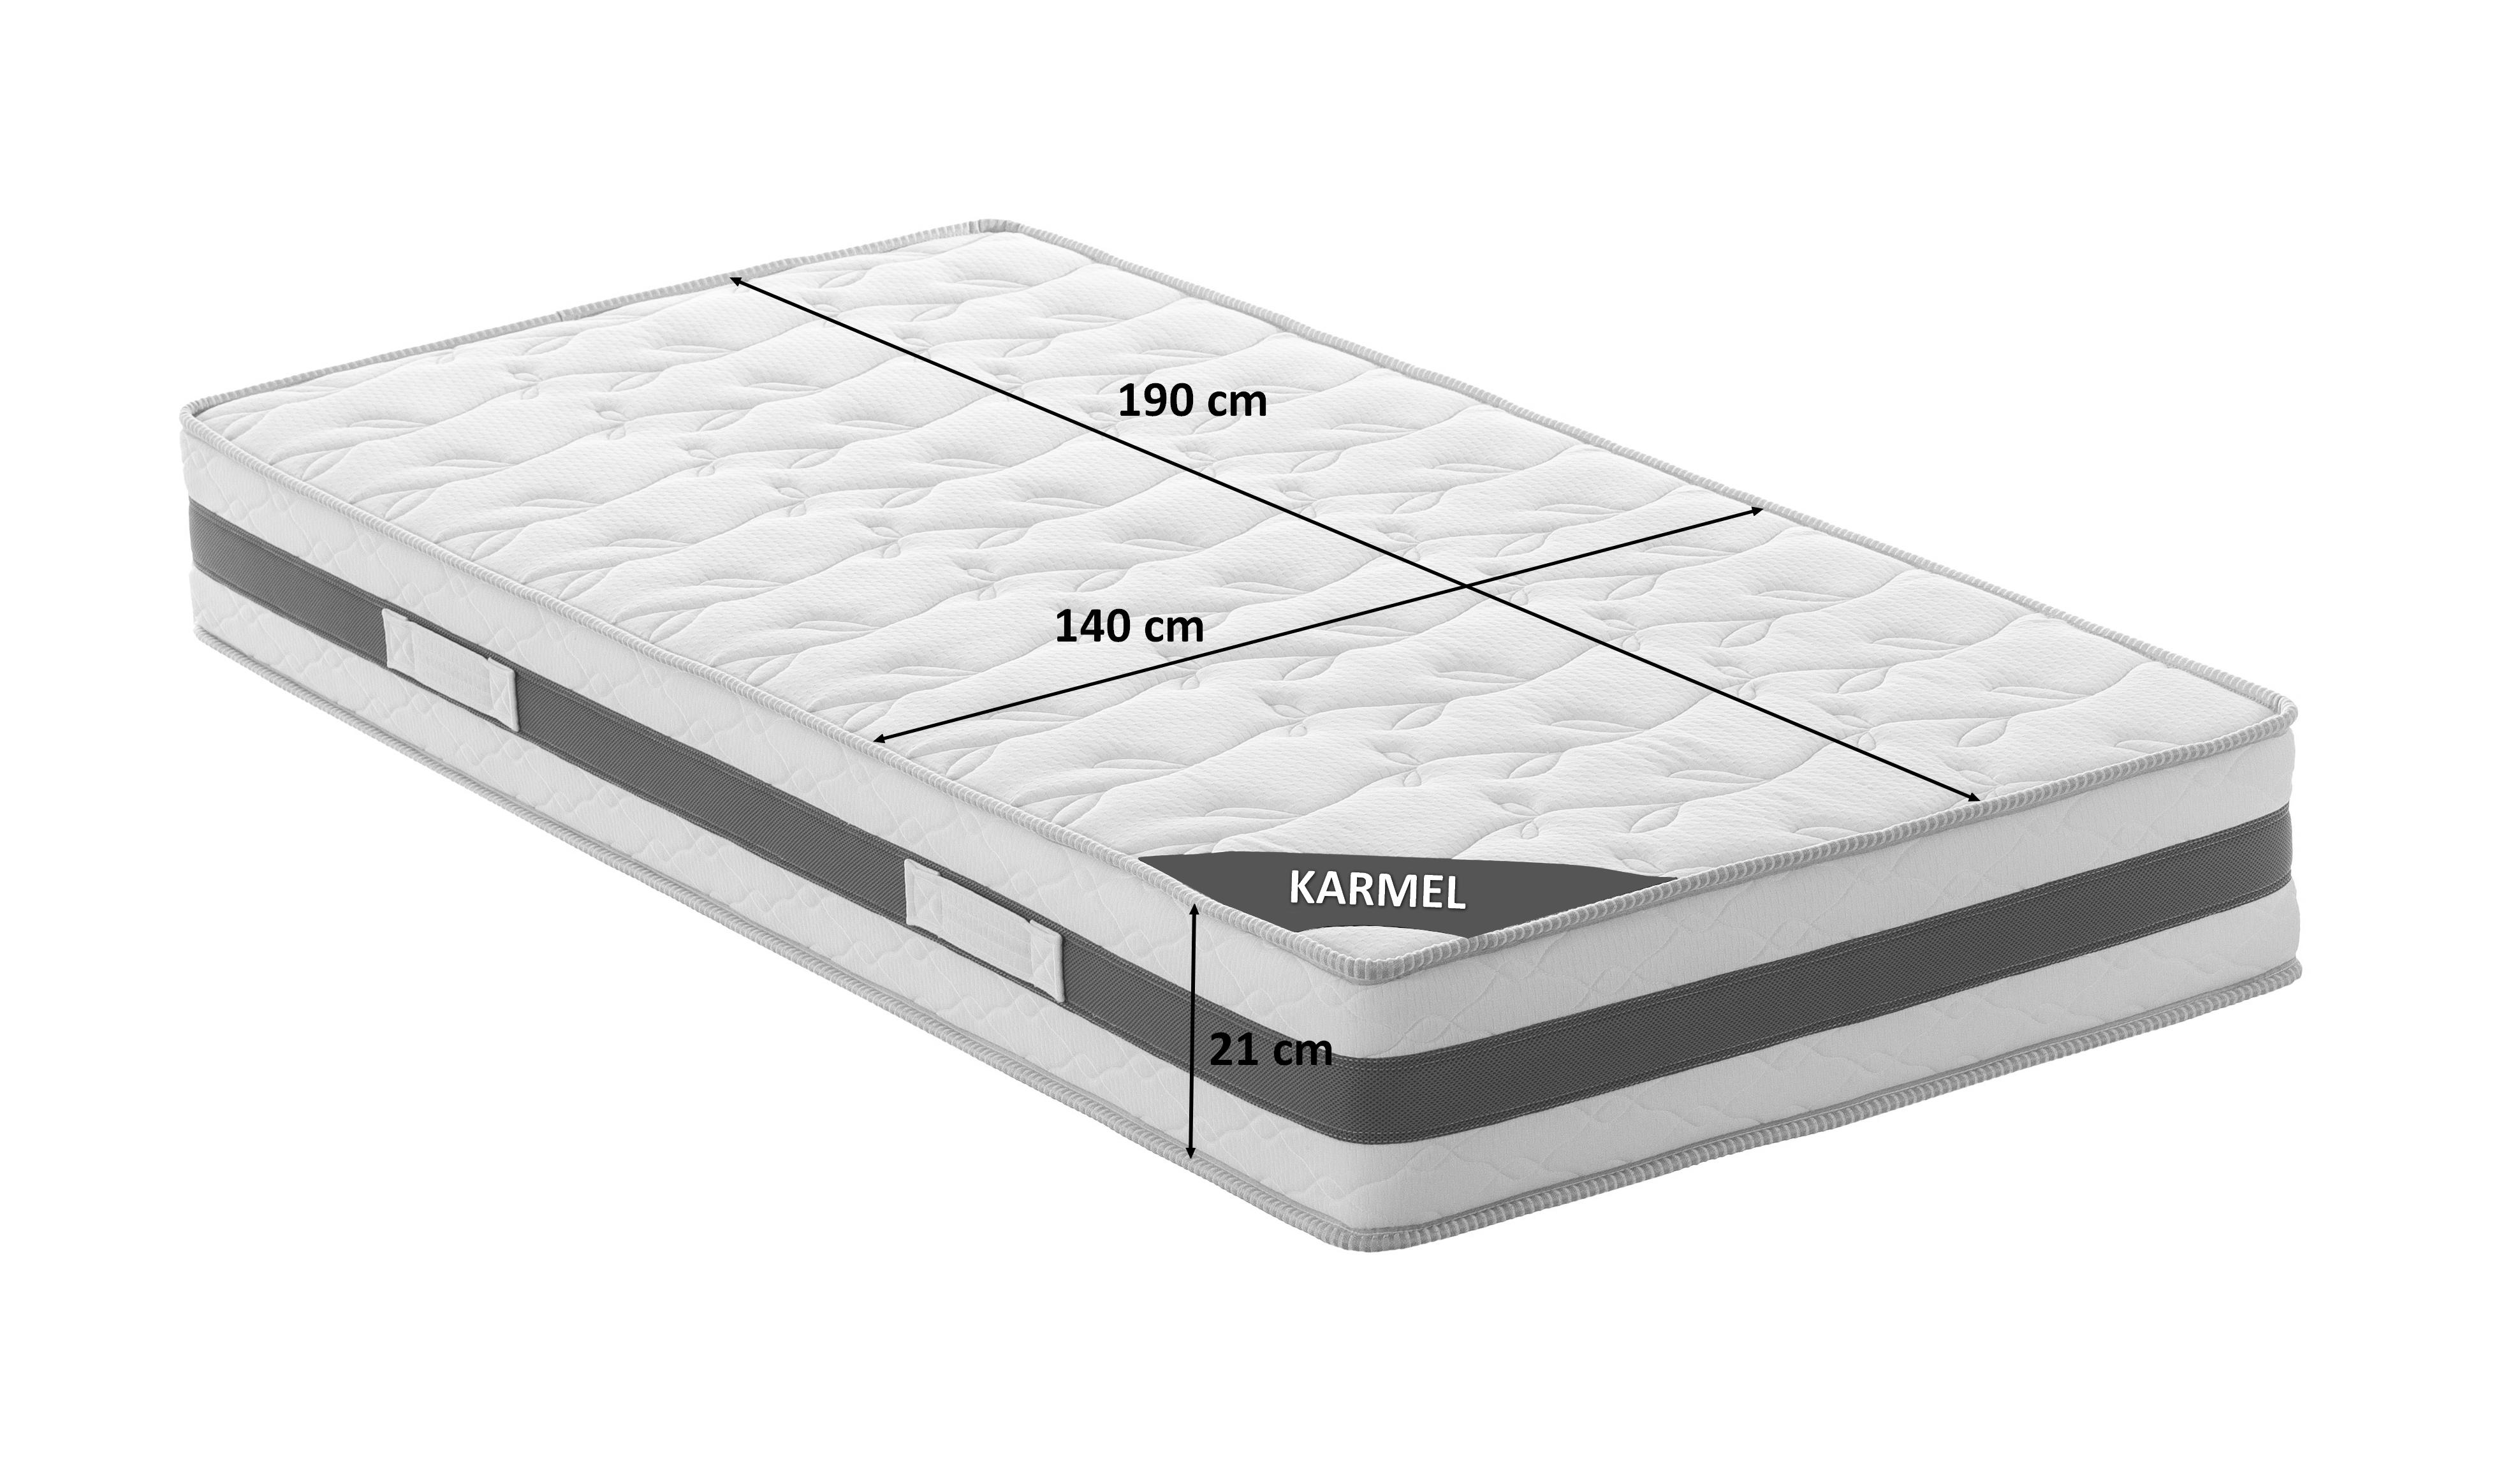 matelas 140x190 cm avec mousse m moire de forme karmel gdegdesign. Black Bedroom Furniture Sets. Home Design Ideas